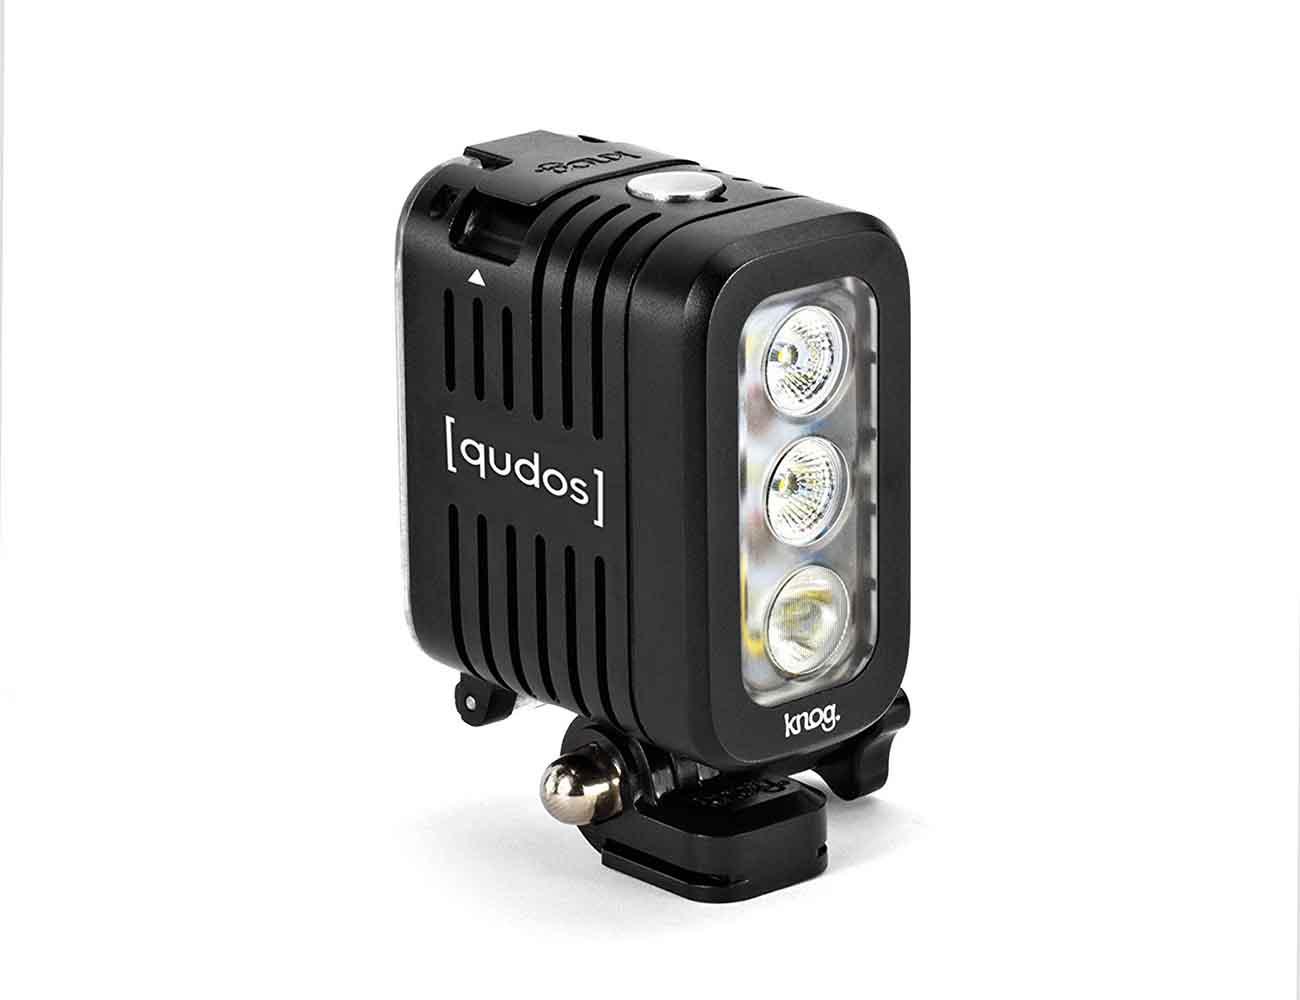 Qudos Action LED Video Light by Knog